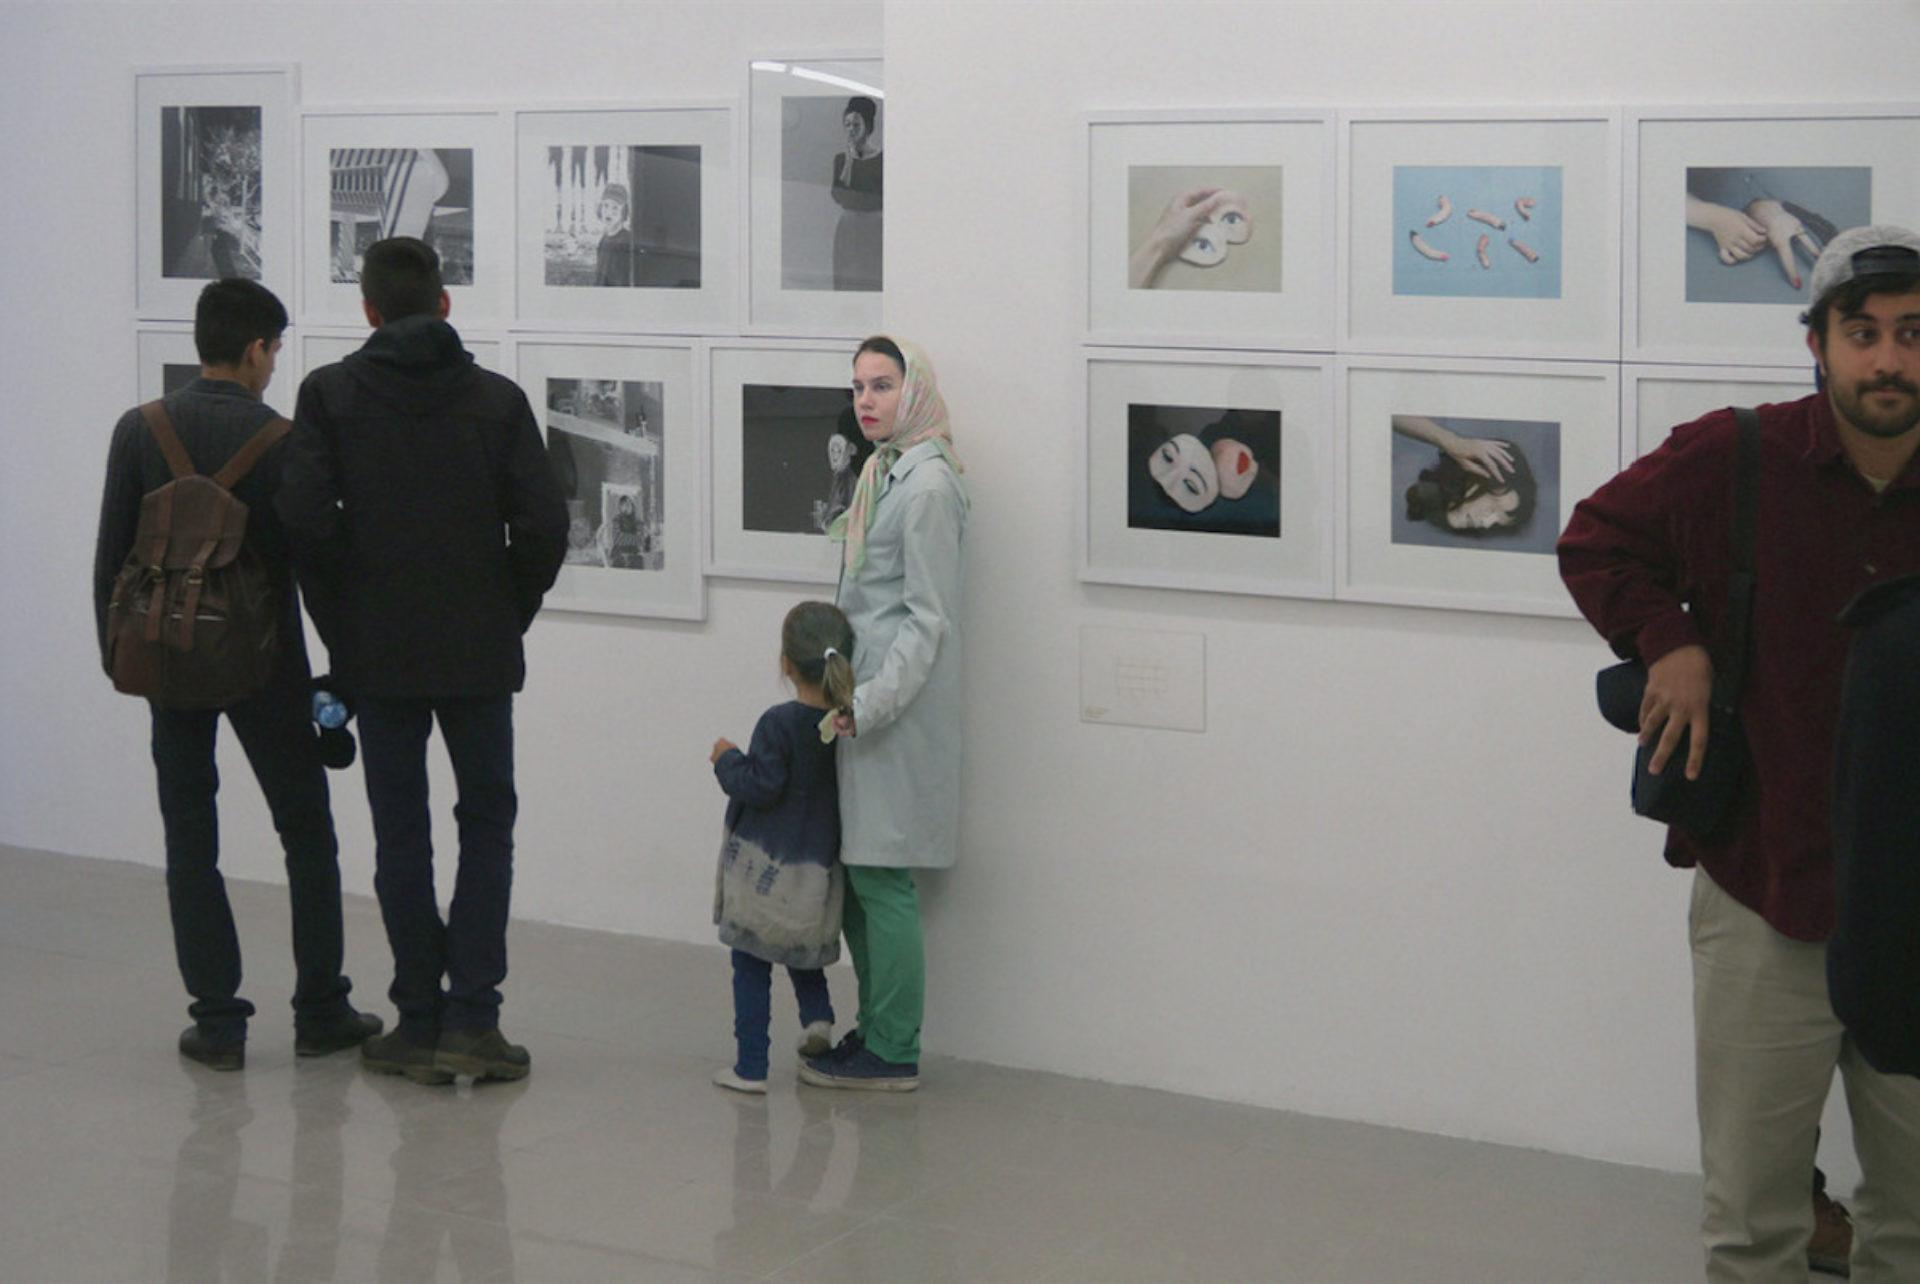 Aneta Grzeszykowska, Iranian Filmstills, 2015, #72